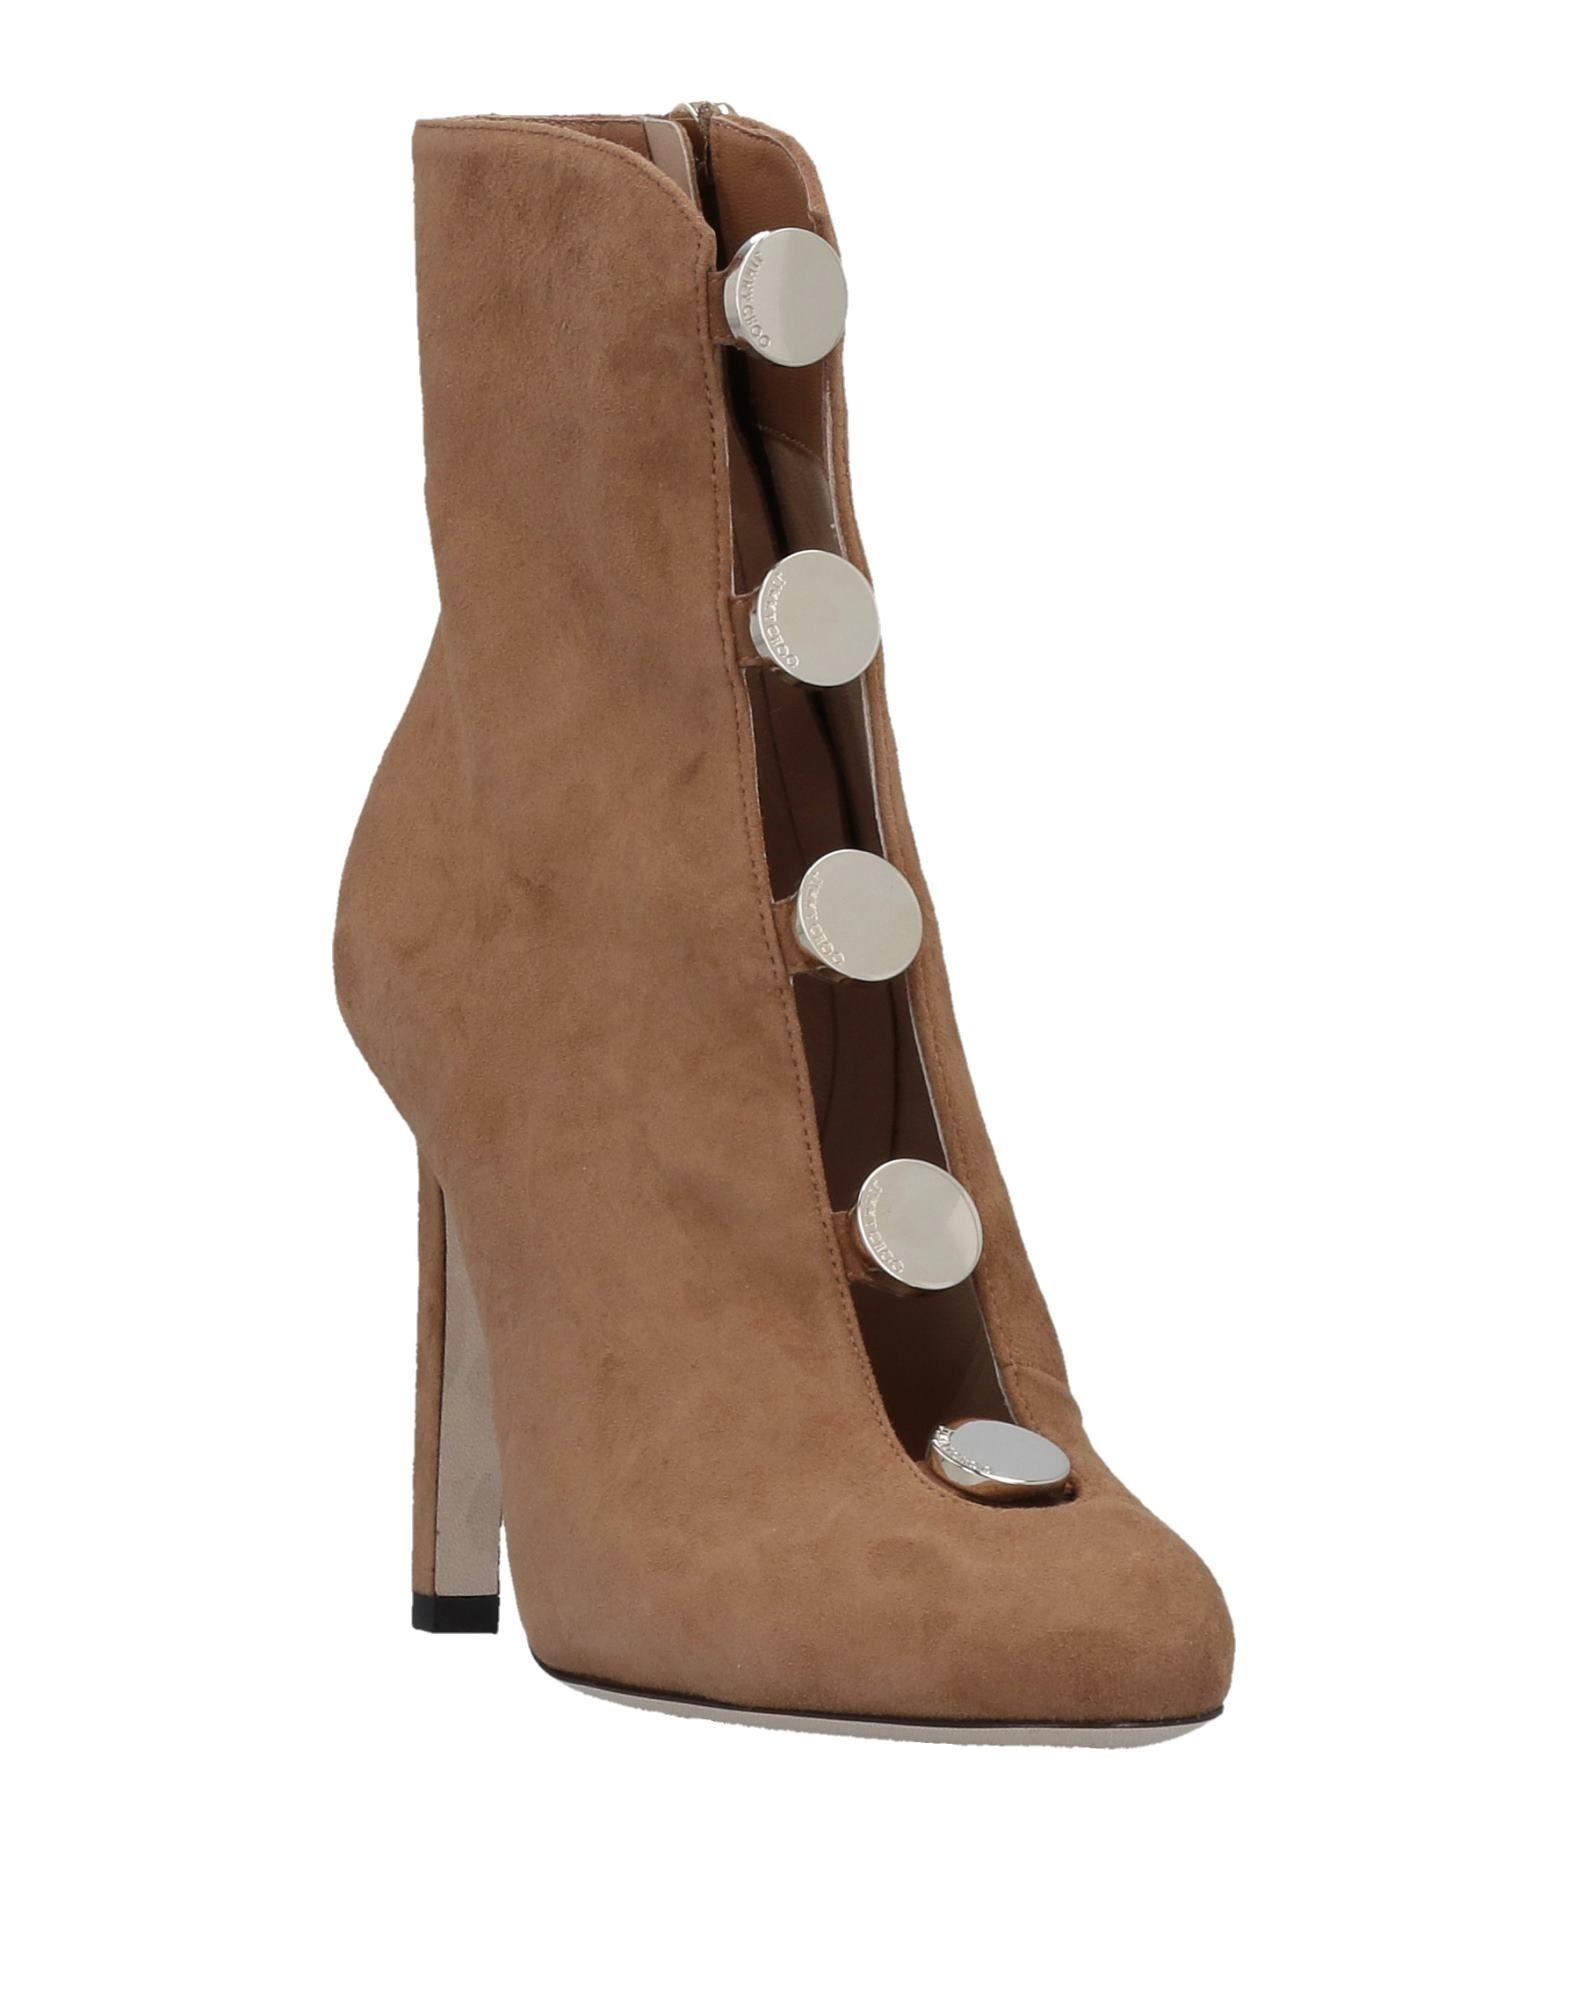 Jimmy Choo Stiefelette aussehende Damen  11508687SEGünstige gut aussehende Stiefelette Schuhe 5021ee